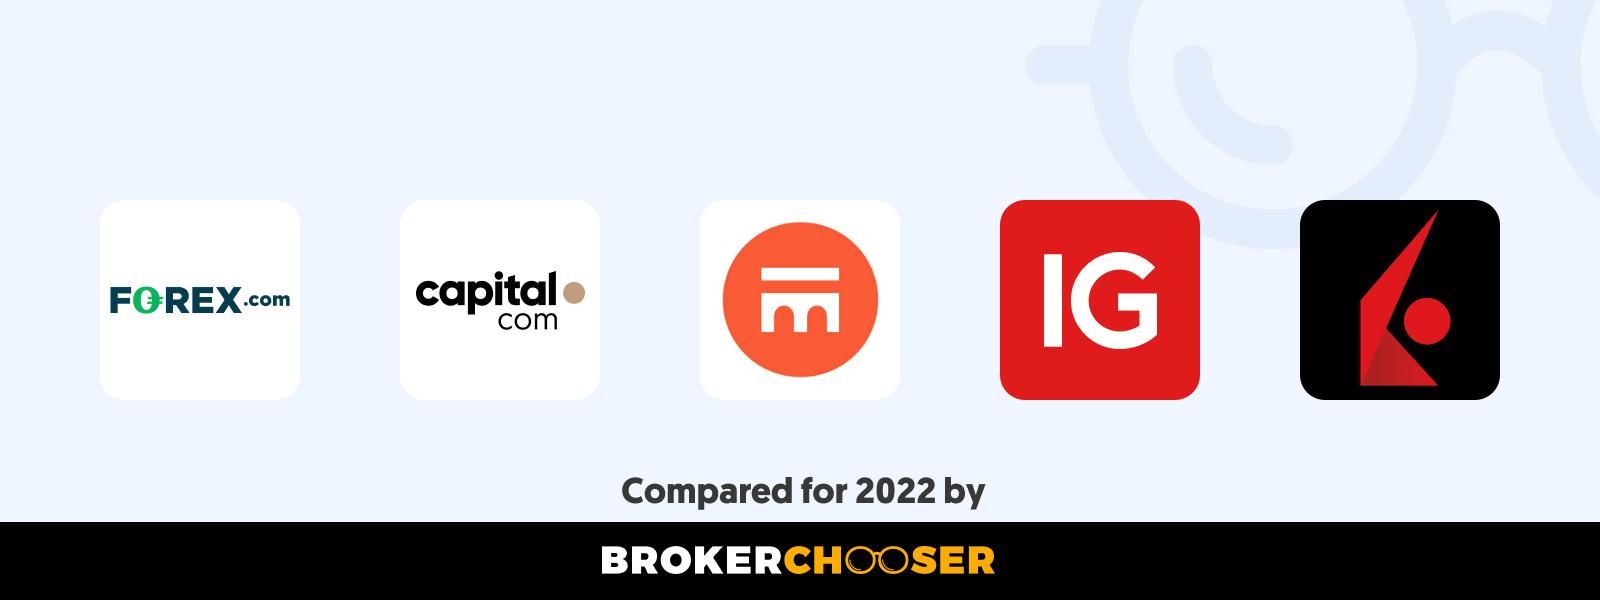 Best forex brokers for beginners in Dominica in 2021